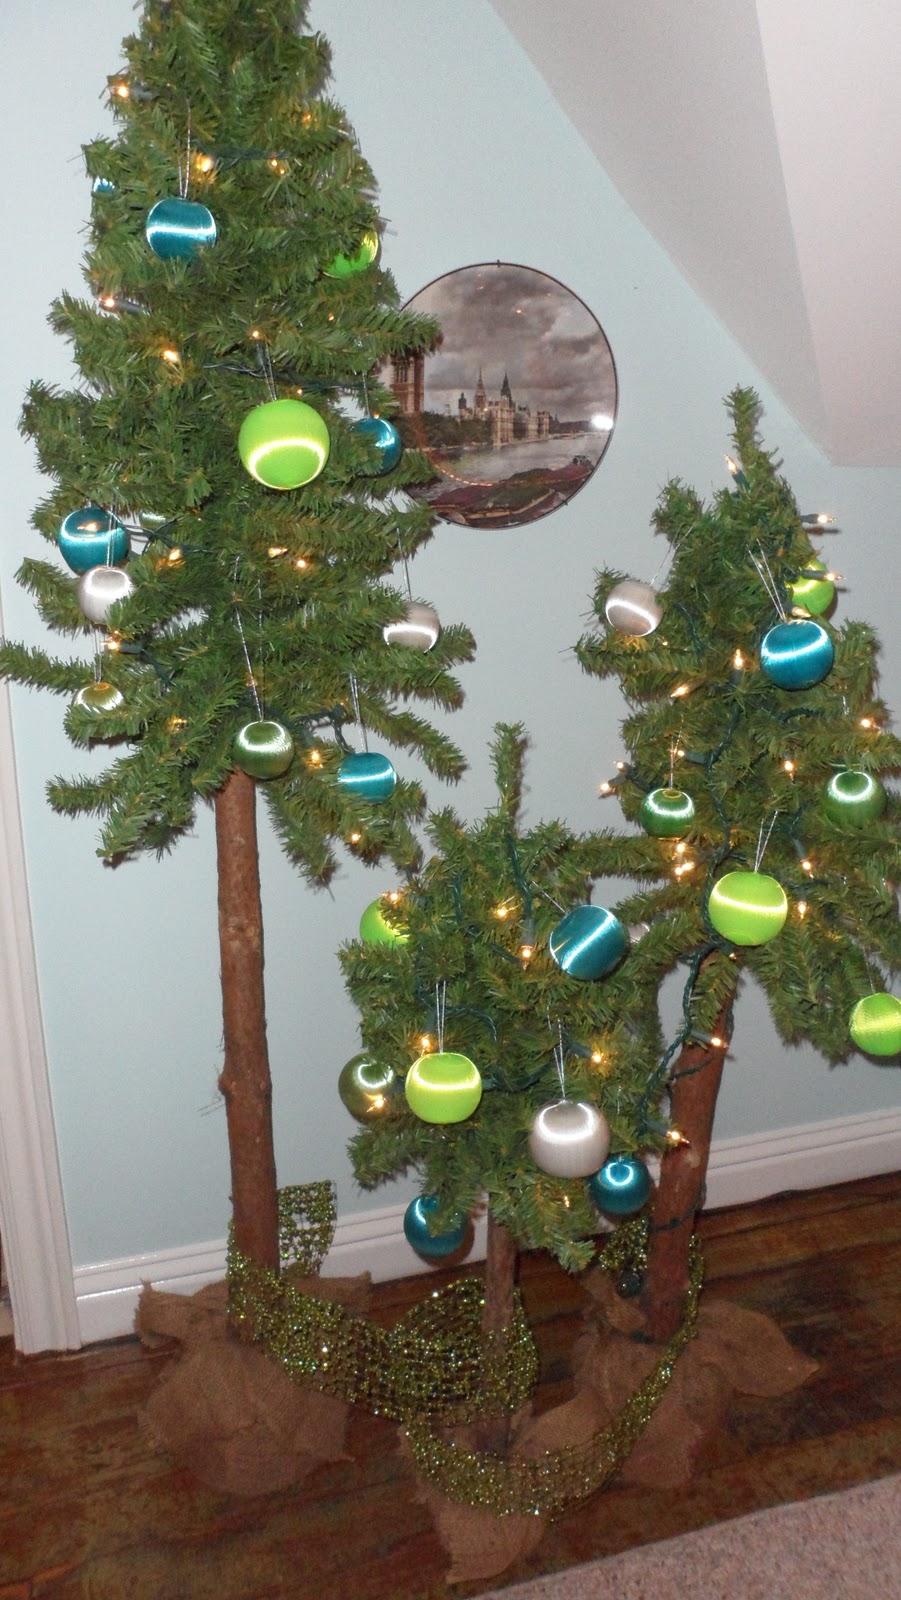 Junk Situation Christmas Trees